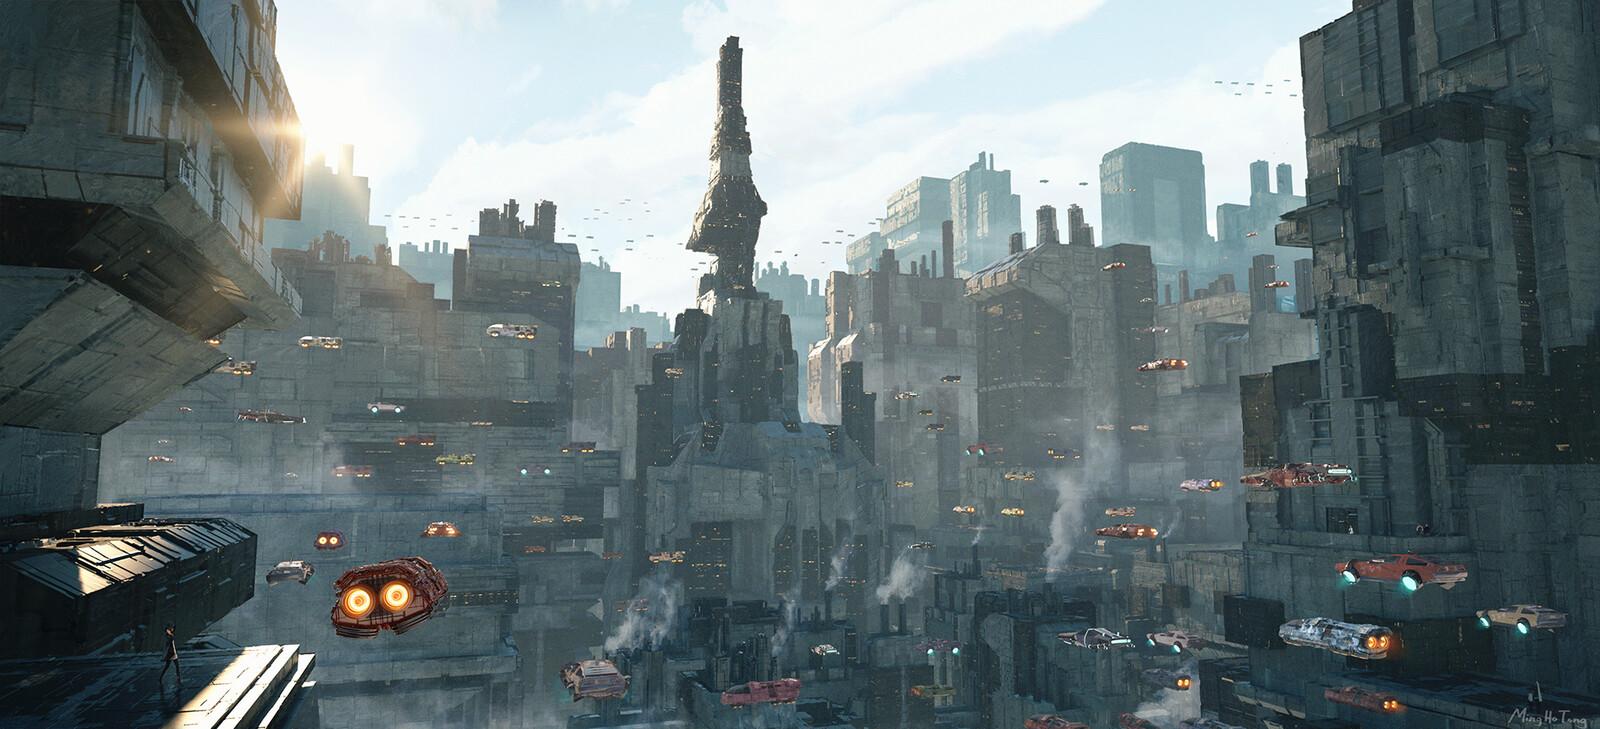 Day City